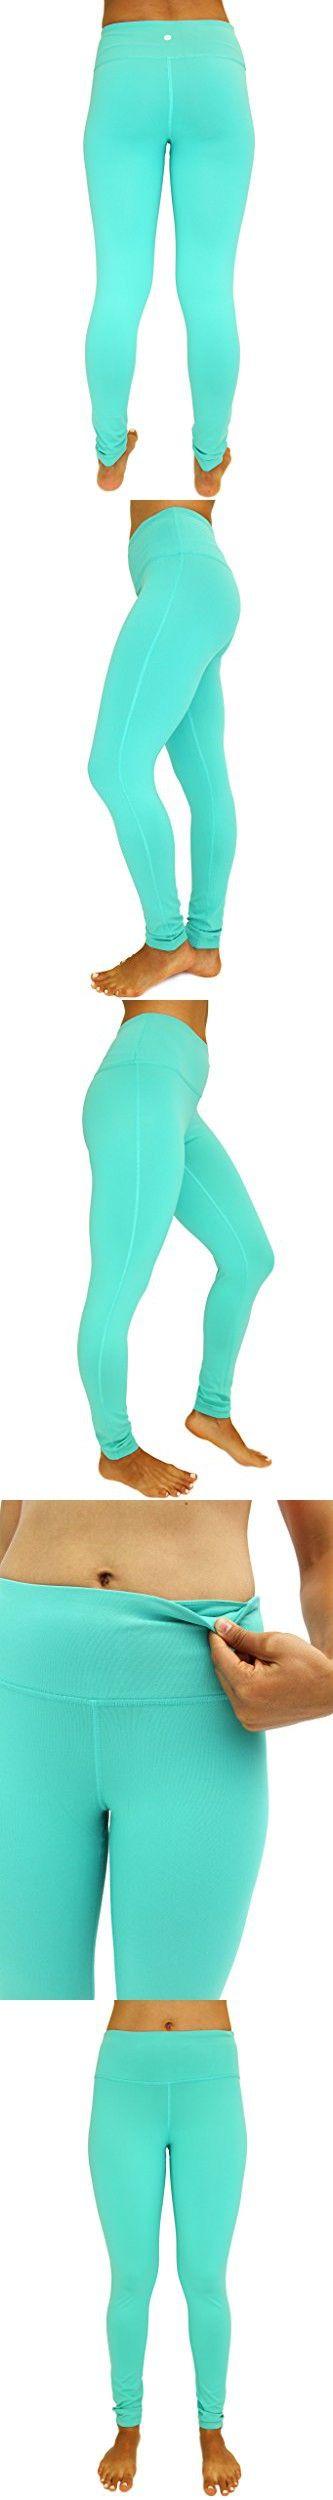 90 Degree by Reflex Power Flex Yoga Pants - Jade - Medium